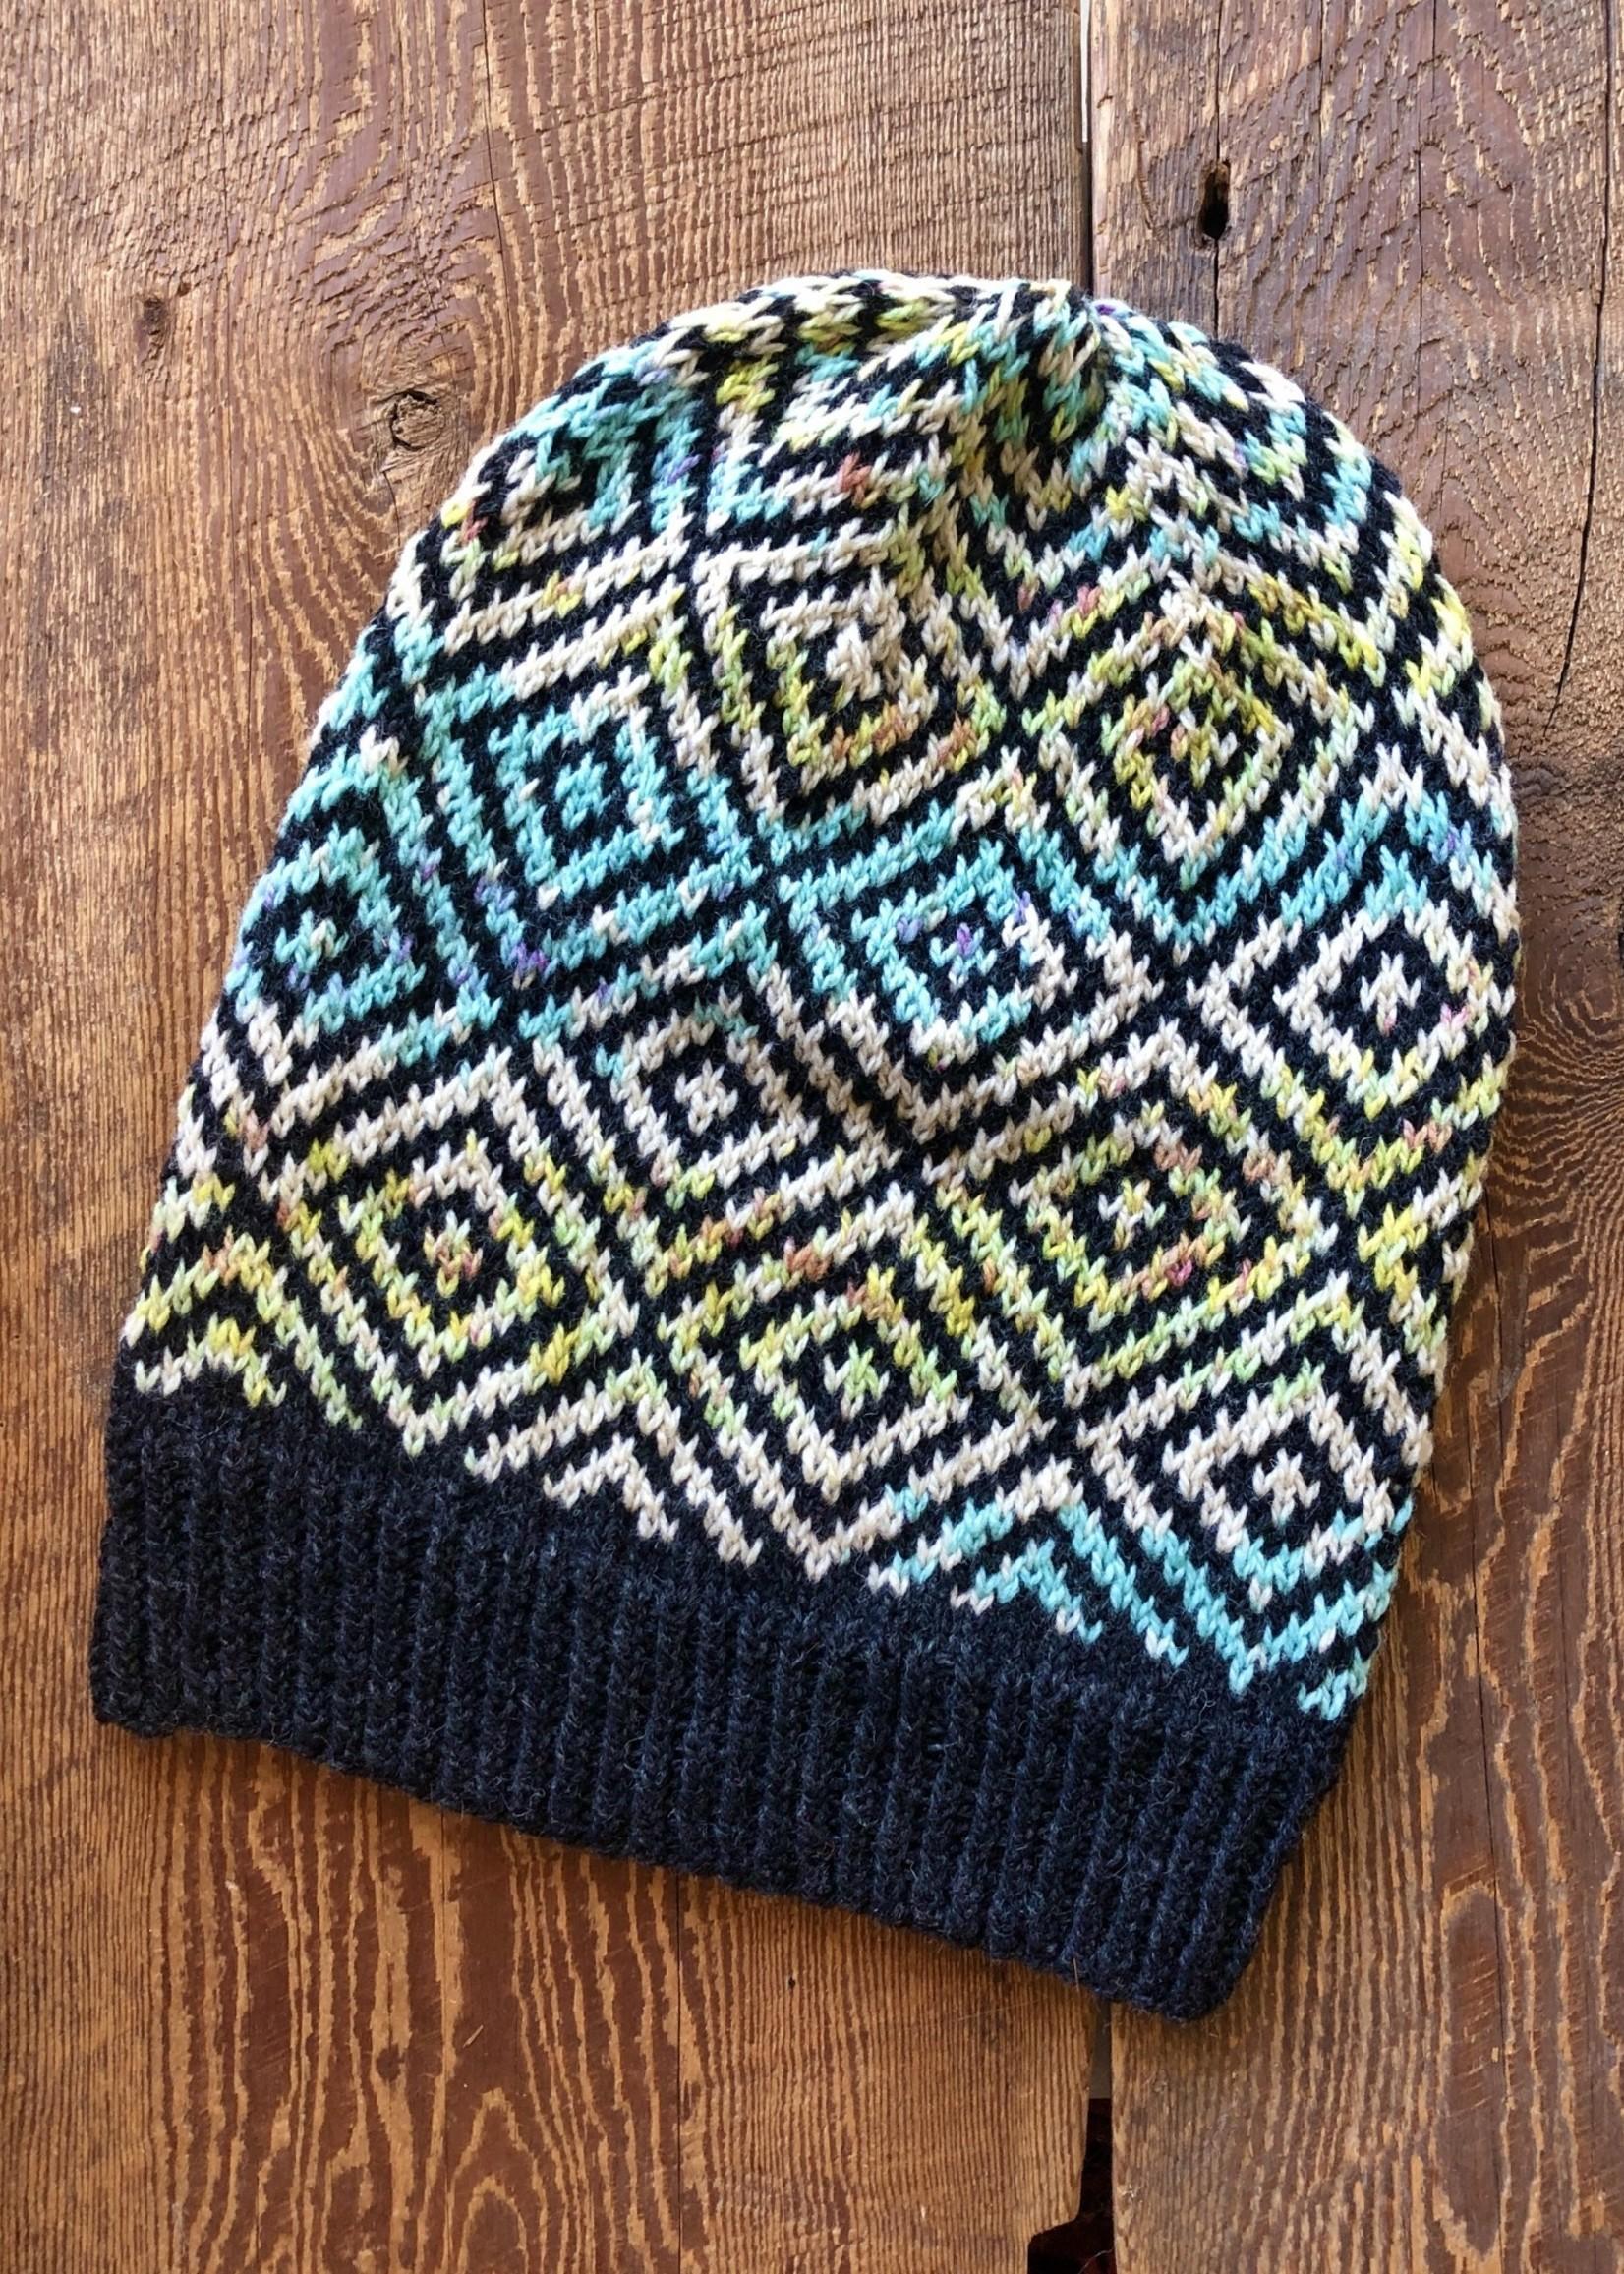 Spun Fibre Pātiki Hat Kit